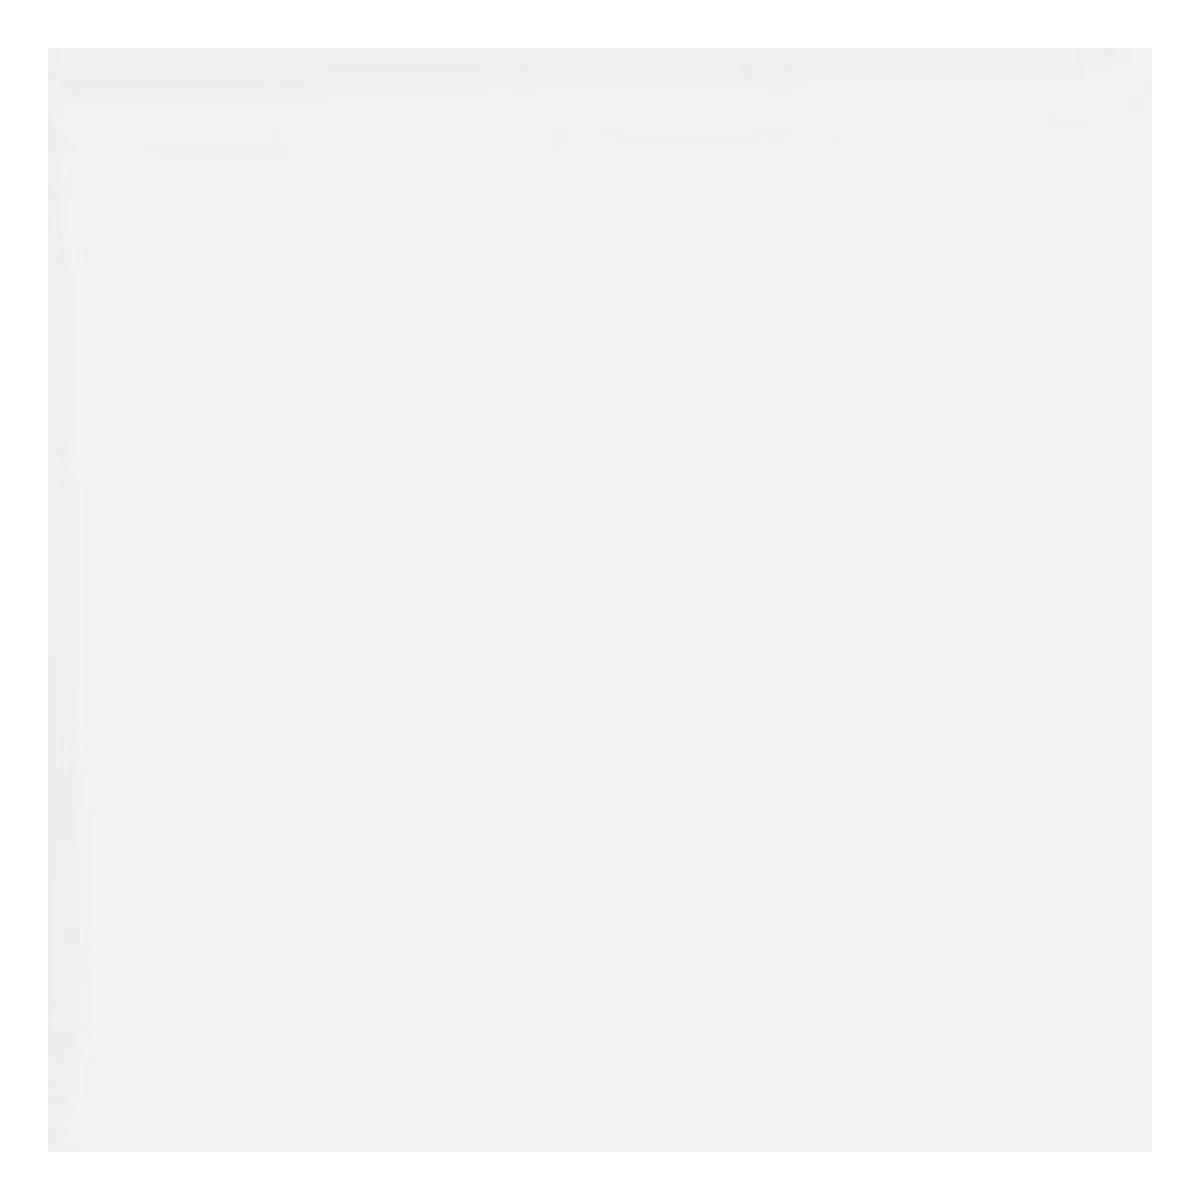 Gres Porcelánico Nieve Blanco Mate - 61X61 cm - 1.48 m2